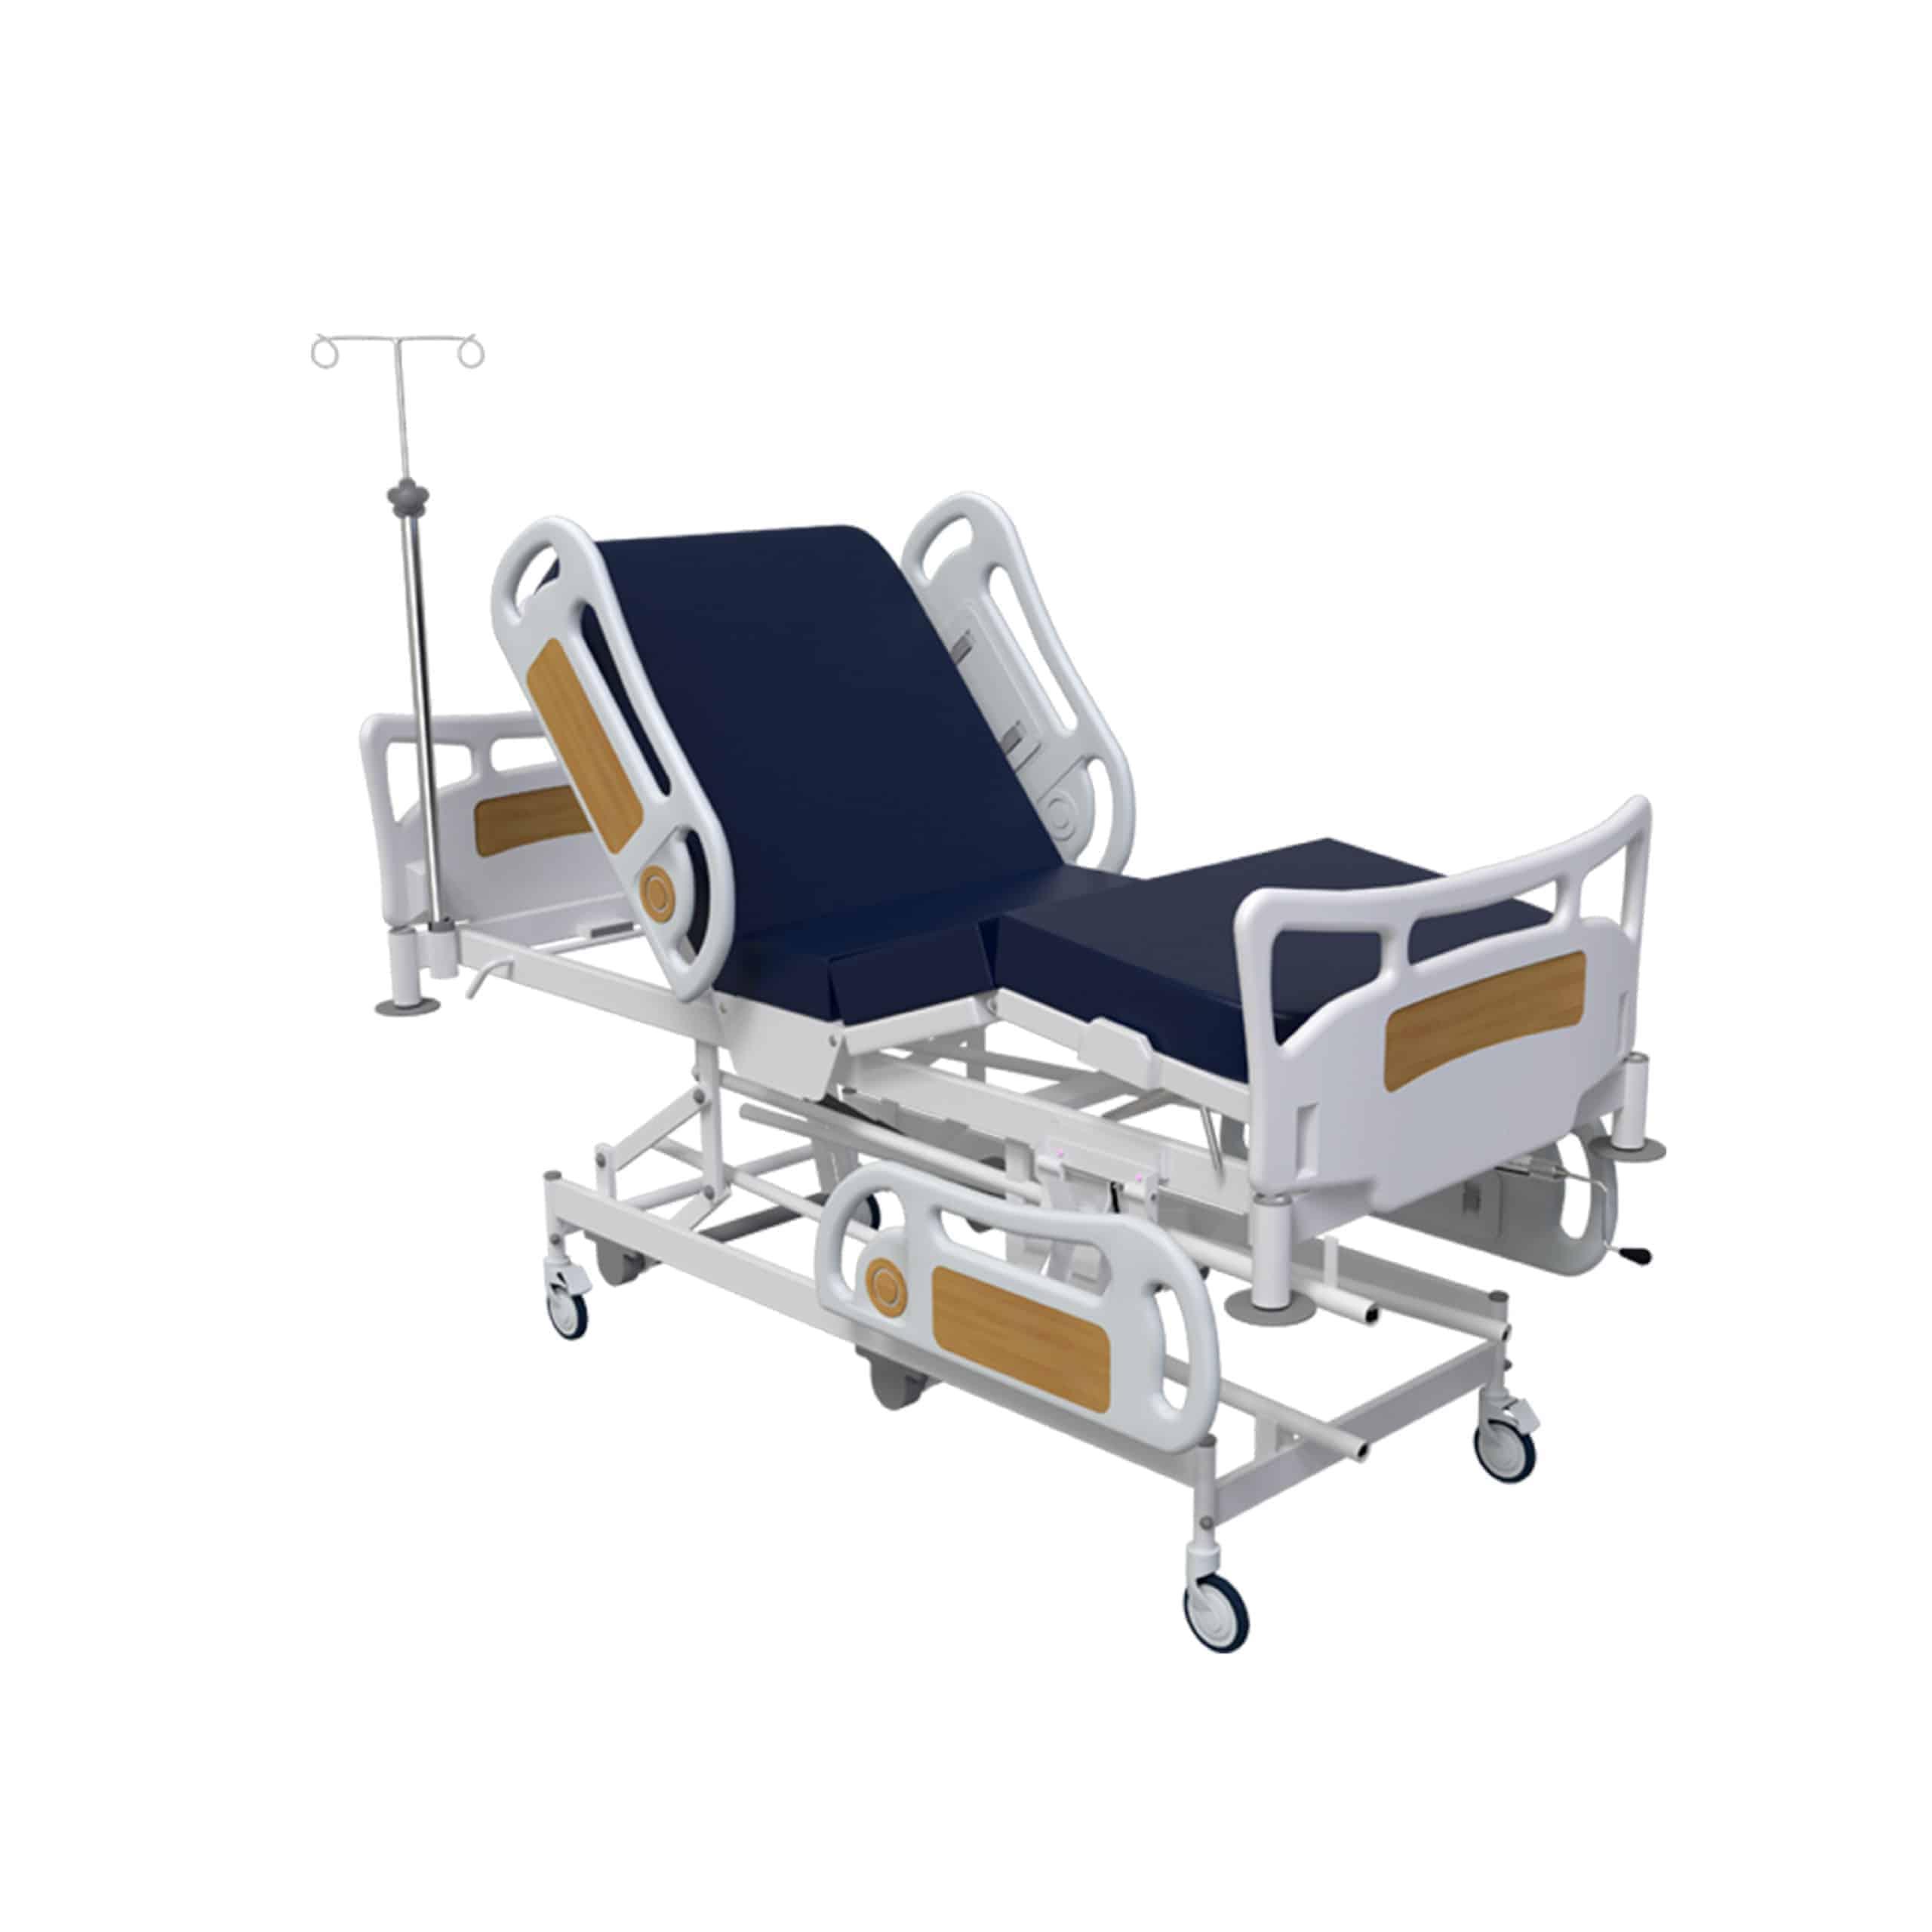 Manual operation hospital ICU beds